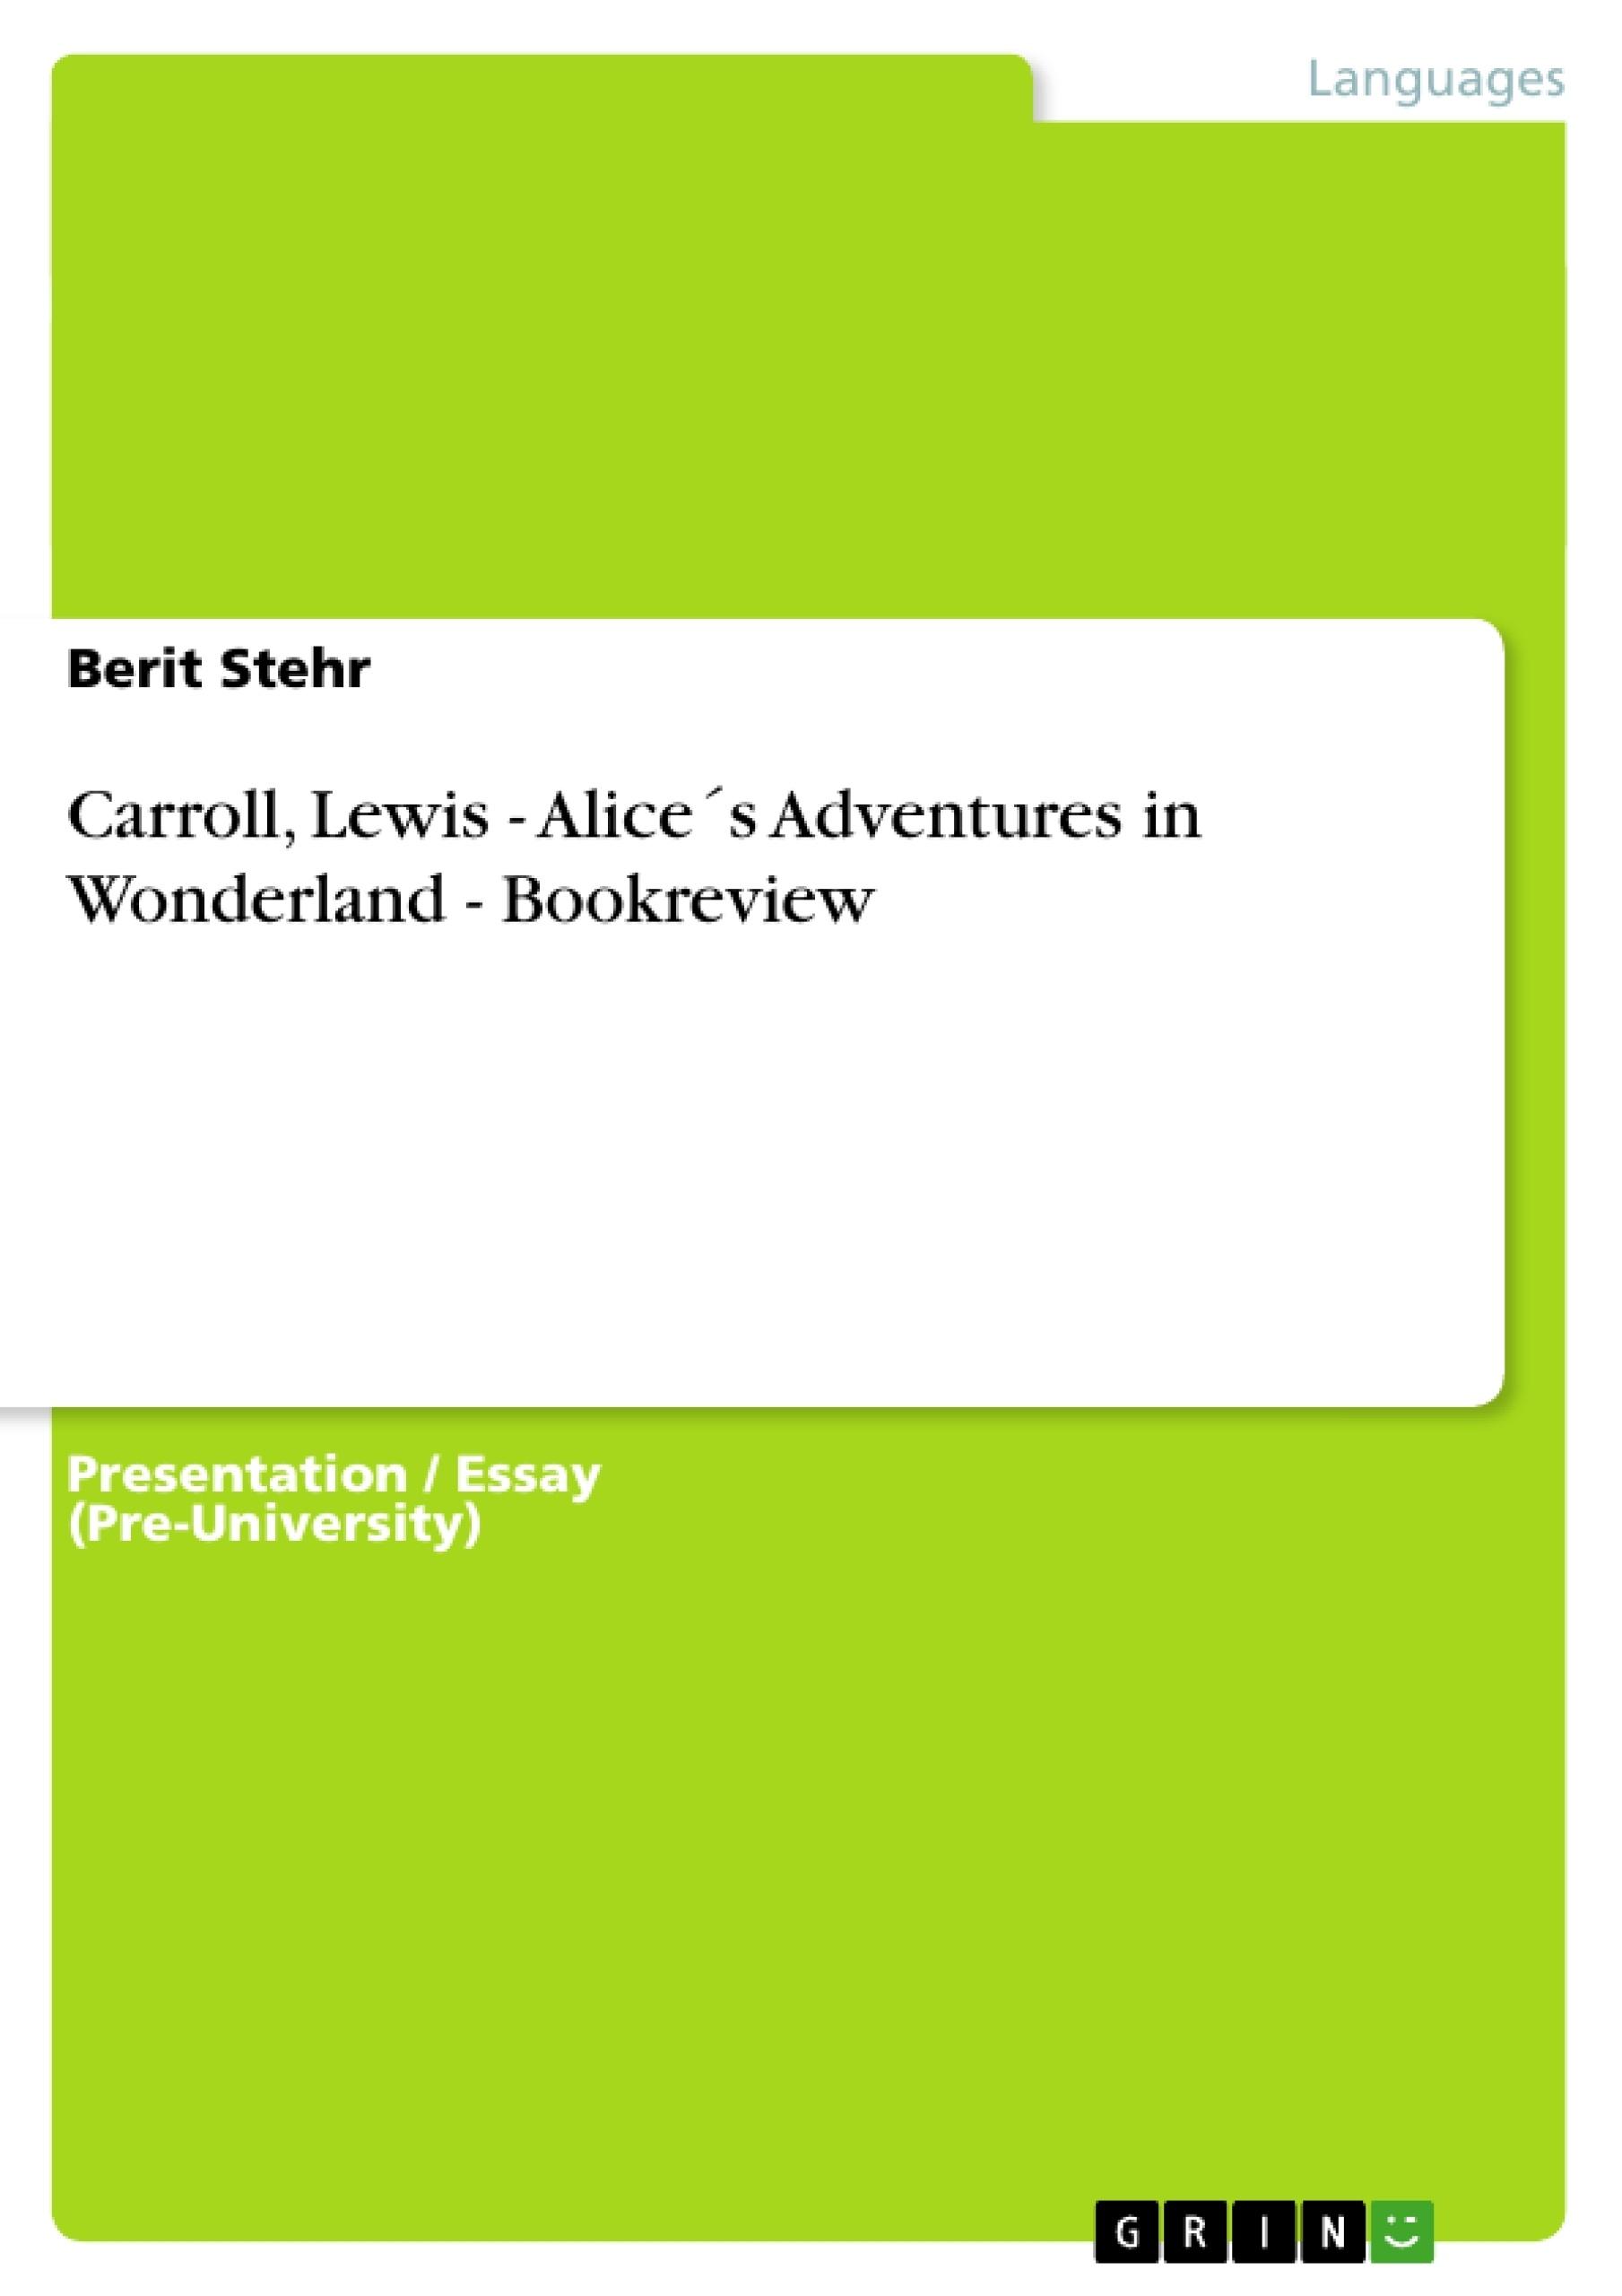 Title: Carroll, Lewis - Alice´s Adventures in Wonderland - Bookreview